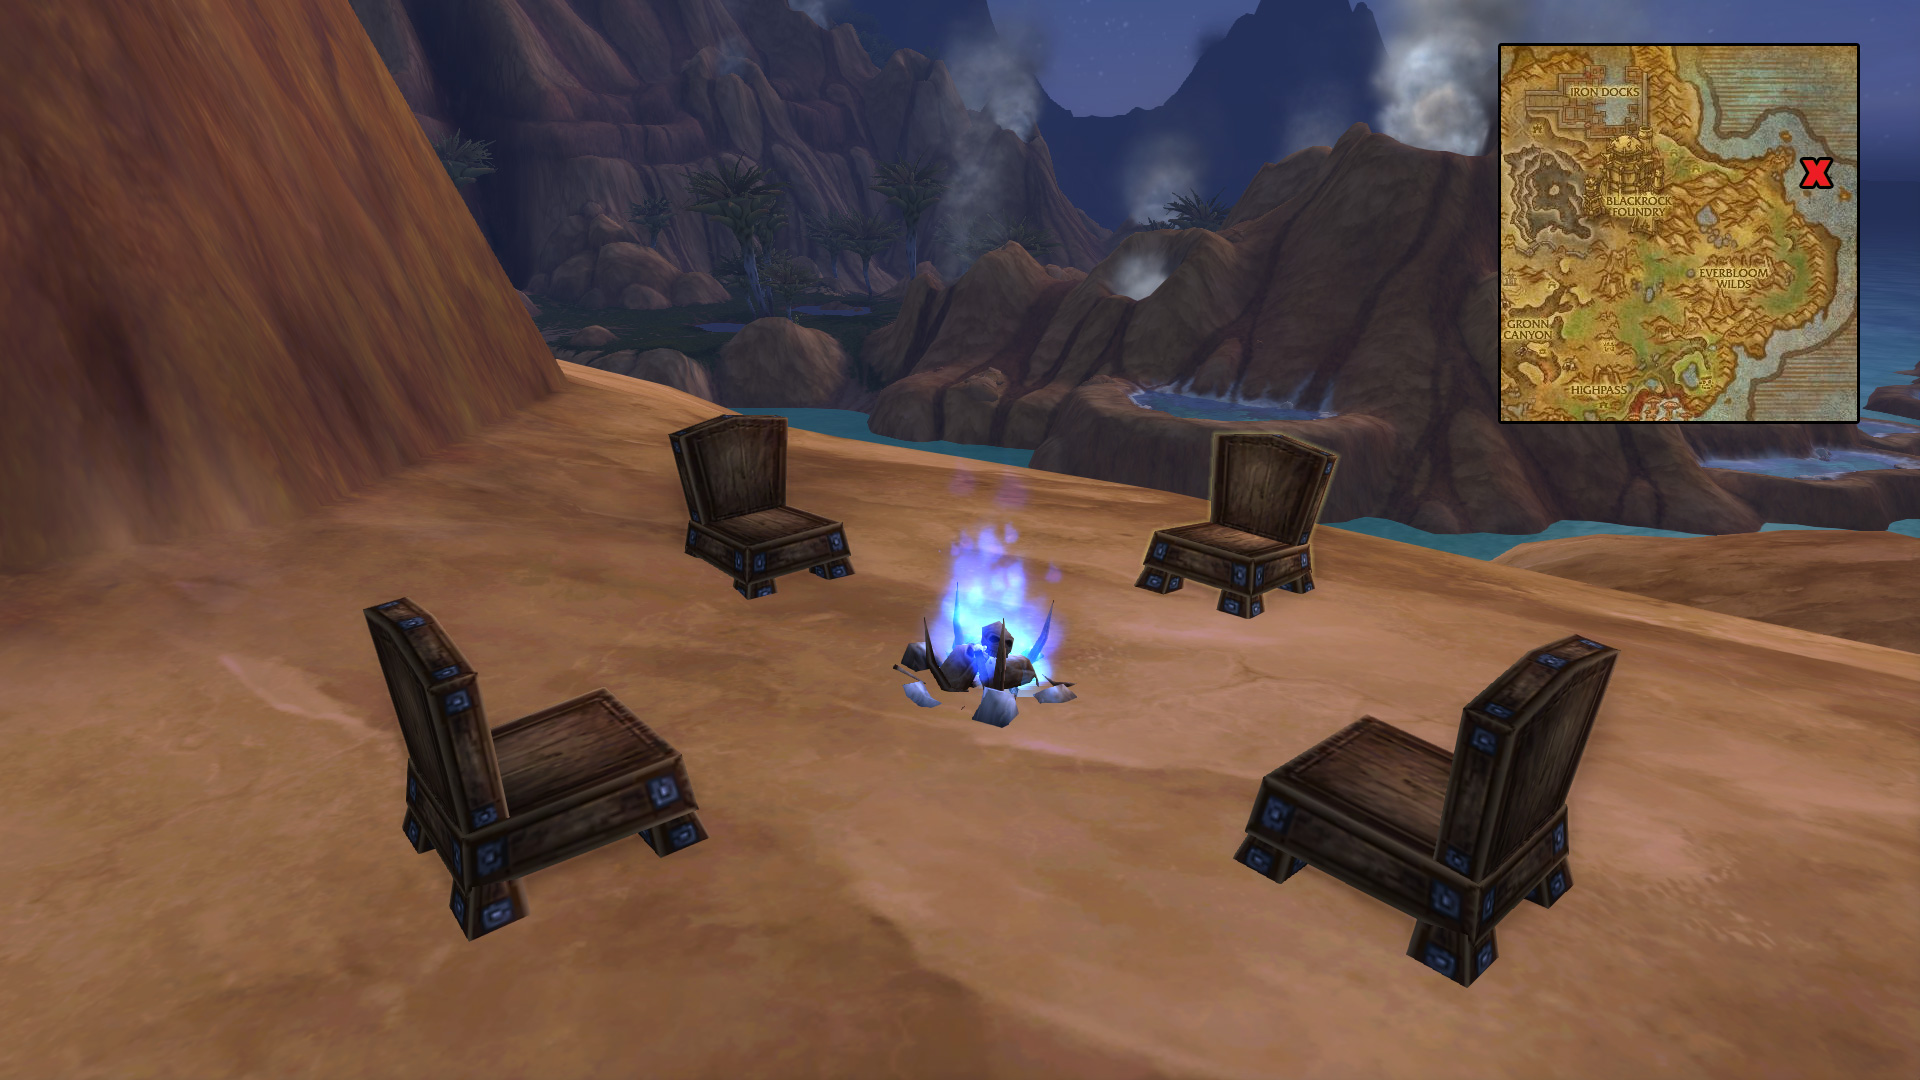 Warcraft Movie Trailer Fan Art, Blue Tweets, Gorgrond